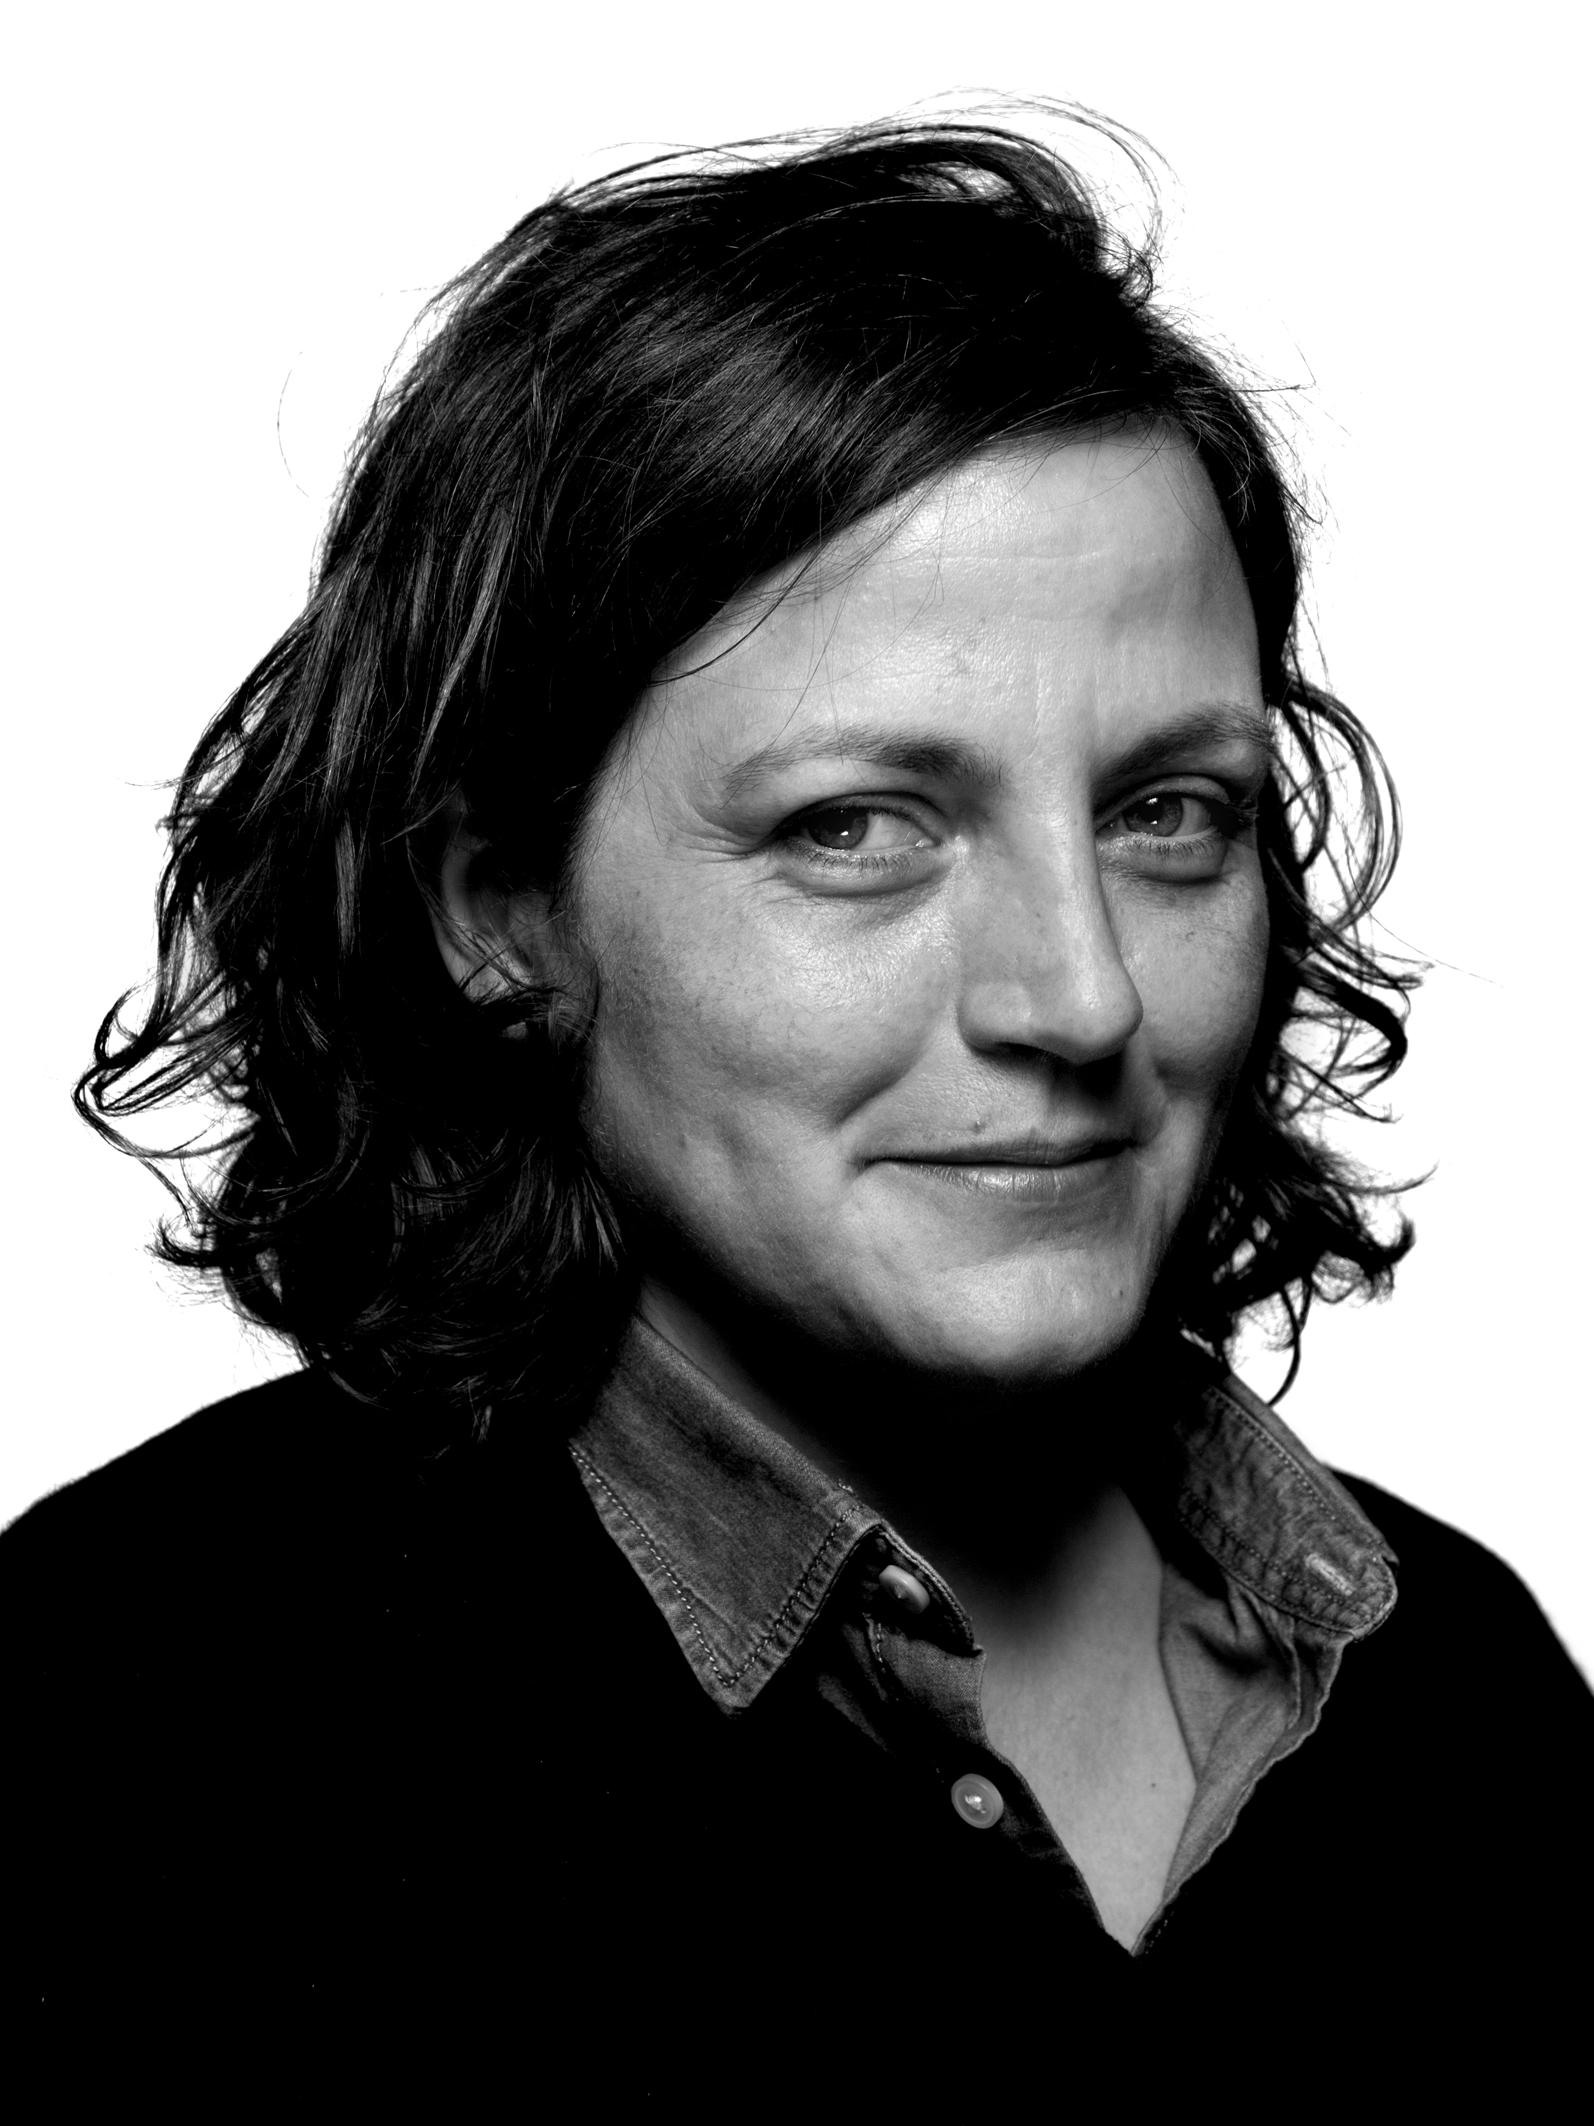 Anne Pauly Avant Que J'oublie : pauly, avant, j'oublie, Lecture, Avant, J'oublie, (Anne, Pauly), «Charybde